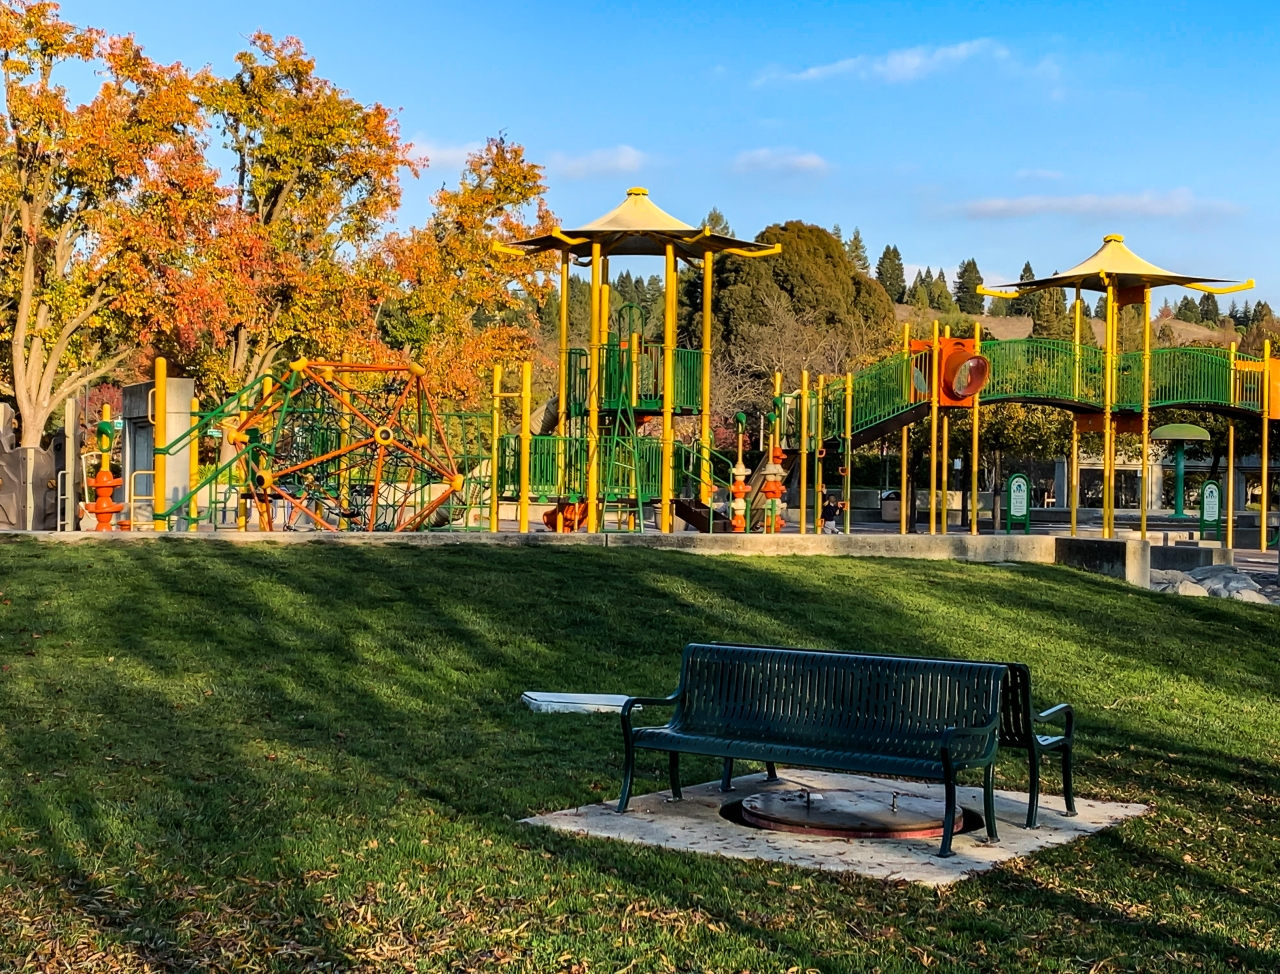 Quiet time @ playground-5825